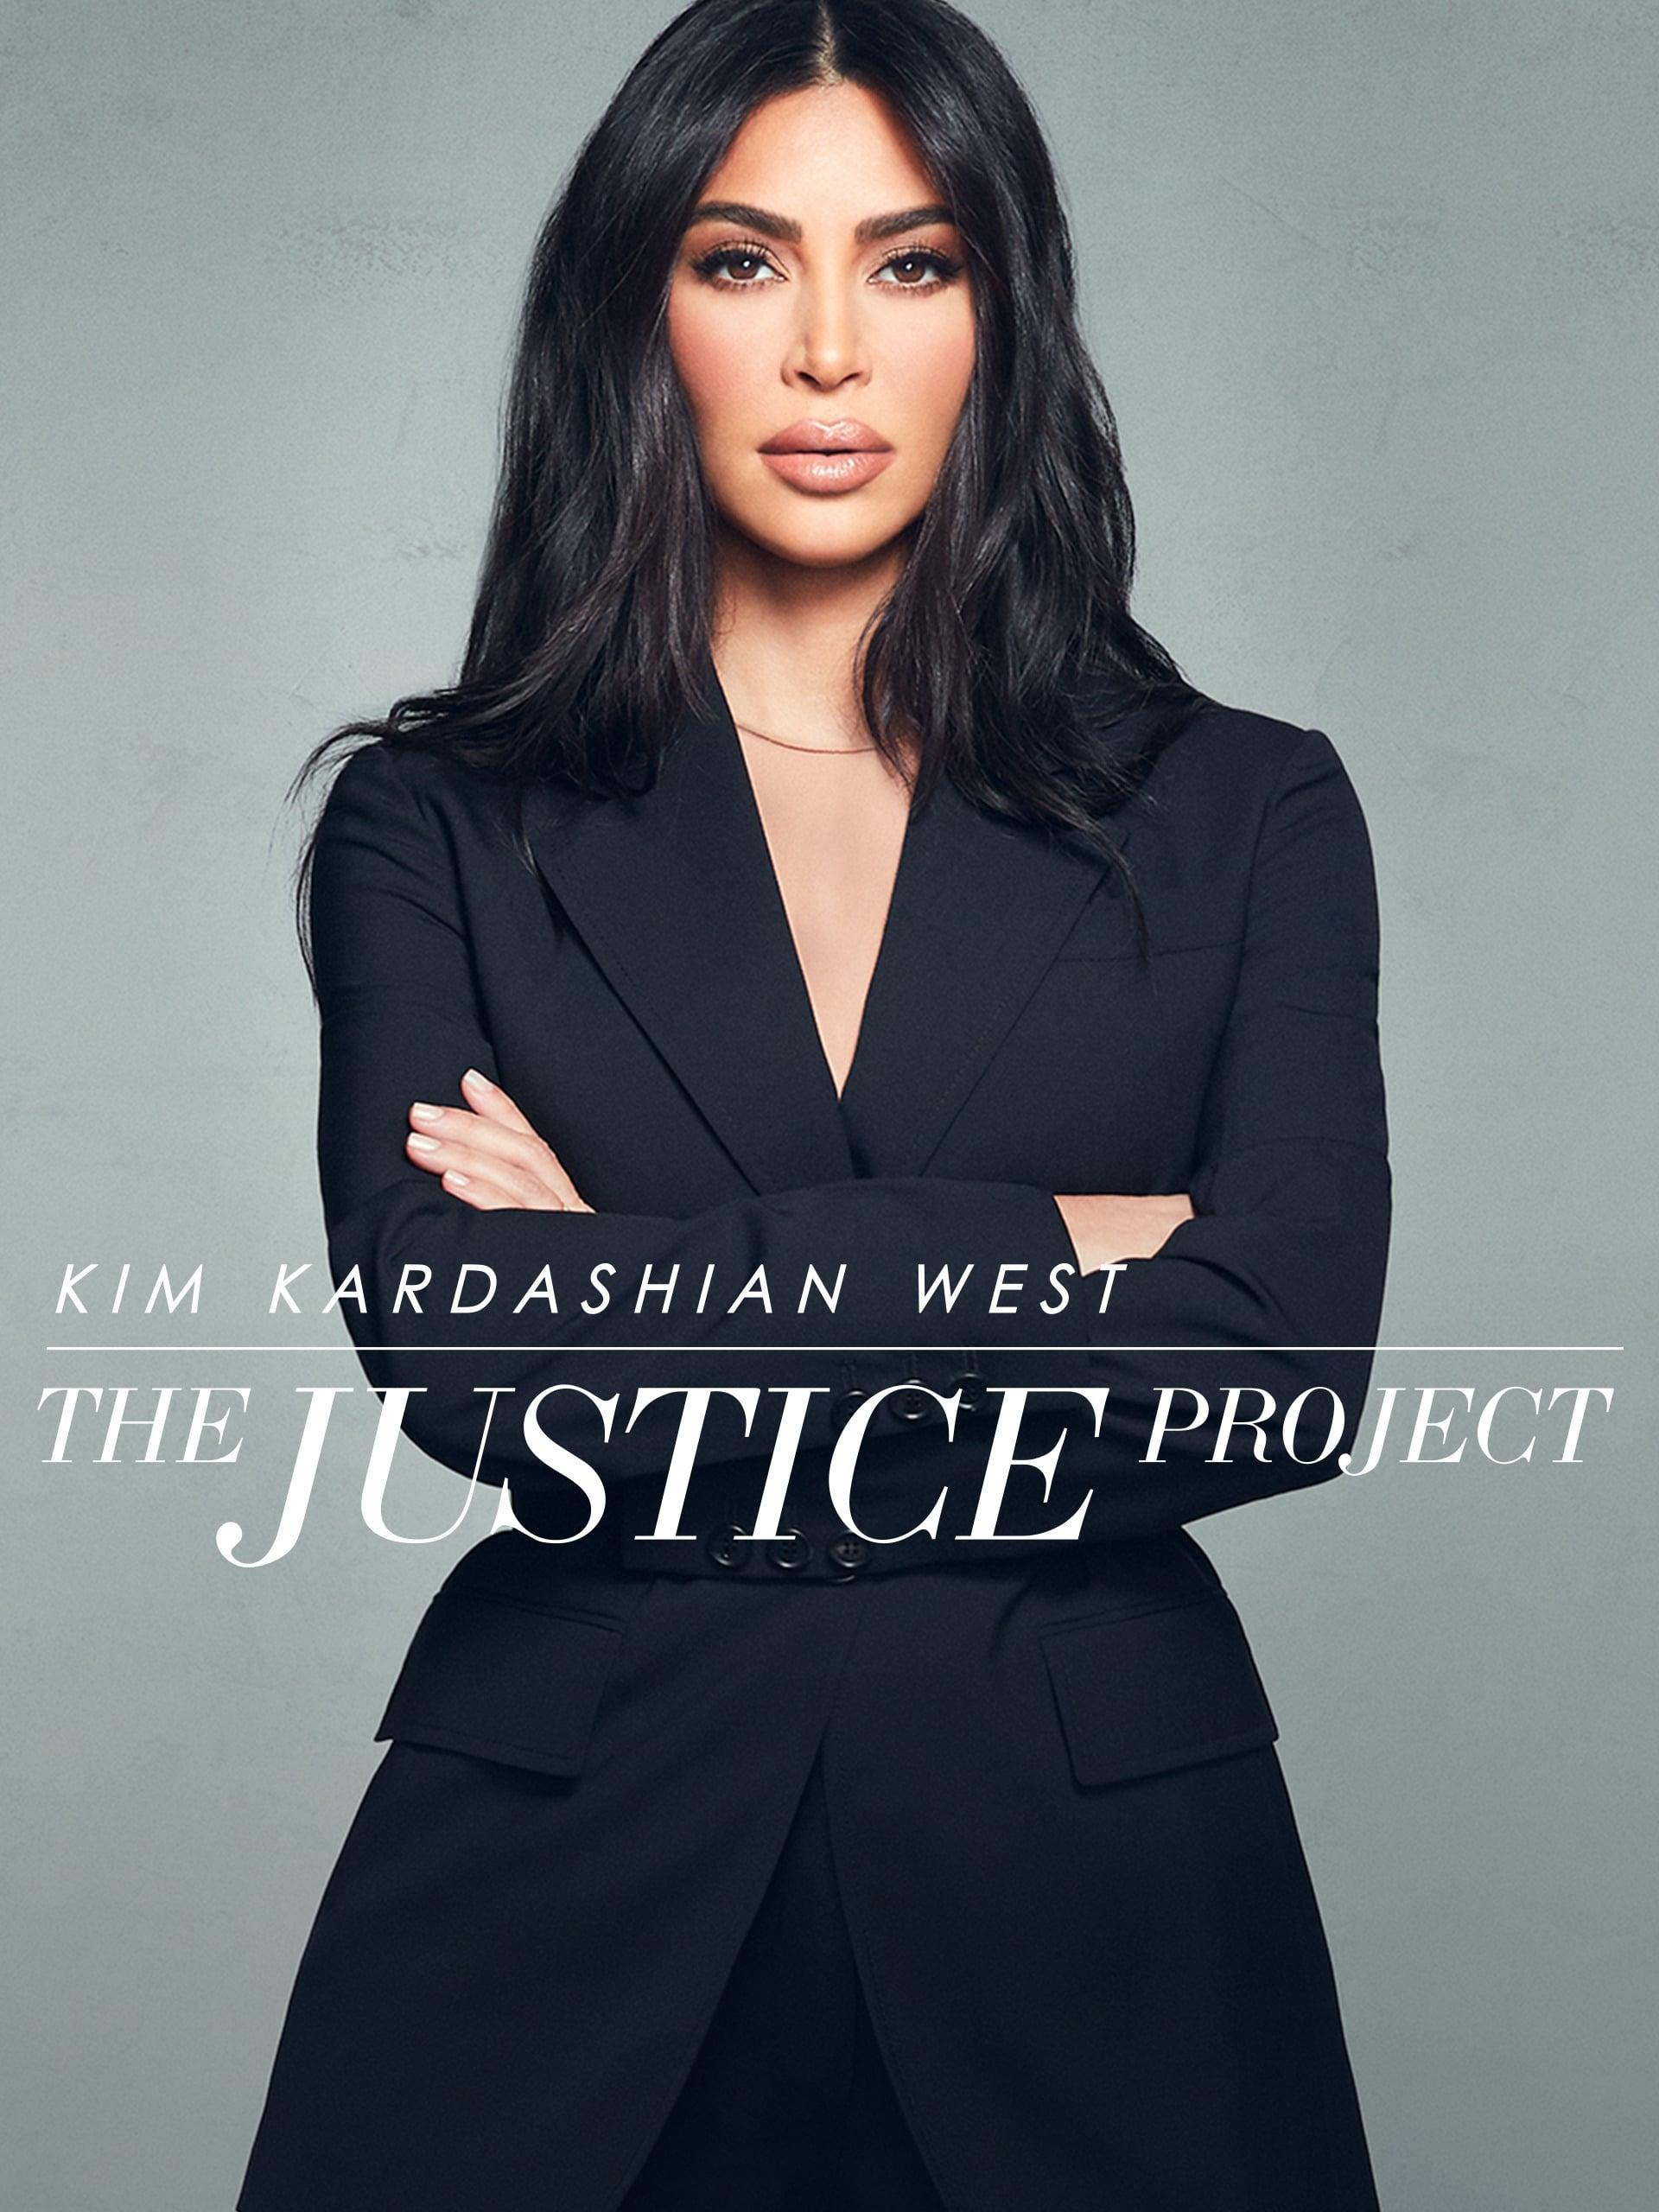 Kim Kardashian West: The Justice Project